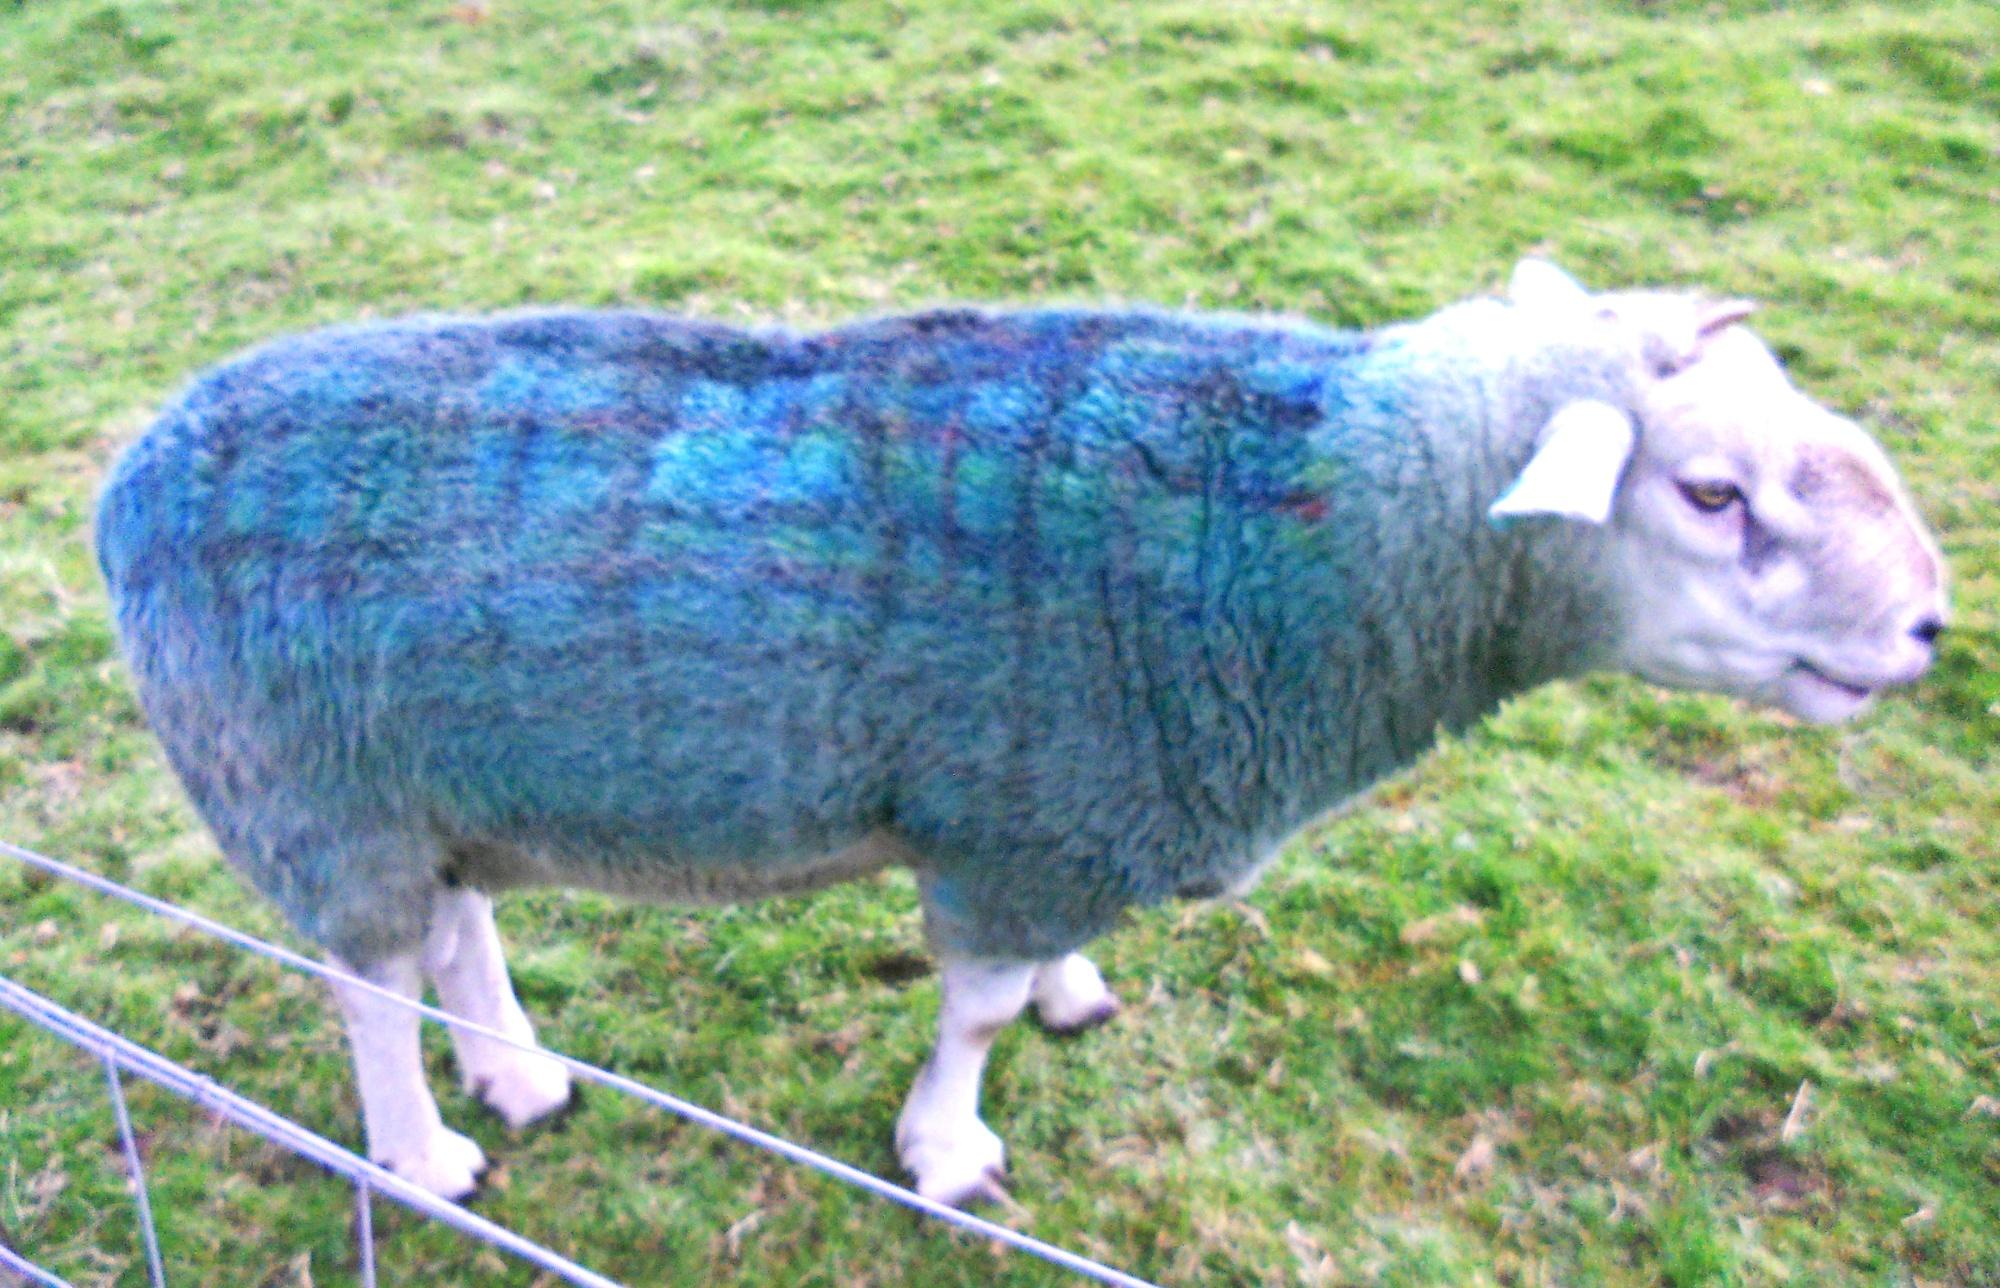 A STRANGE BEAST IS THE TARTAN SHEEP